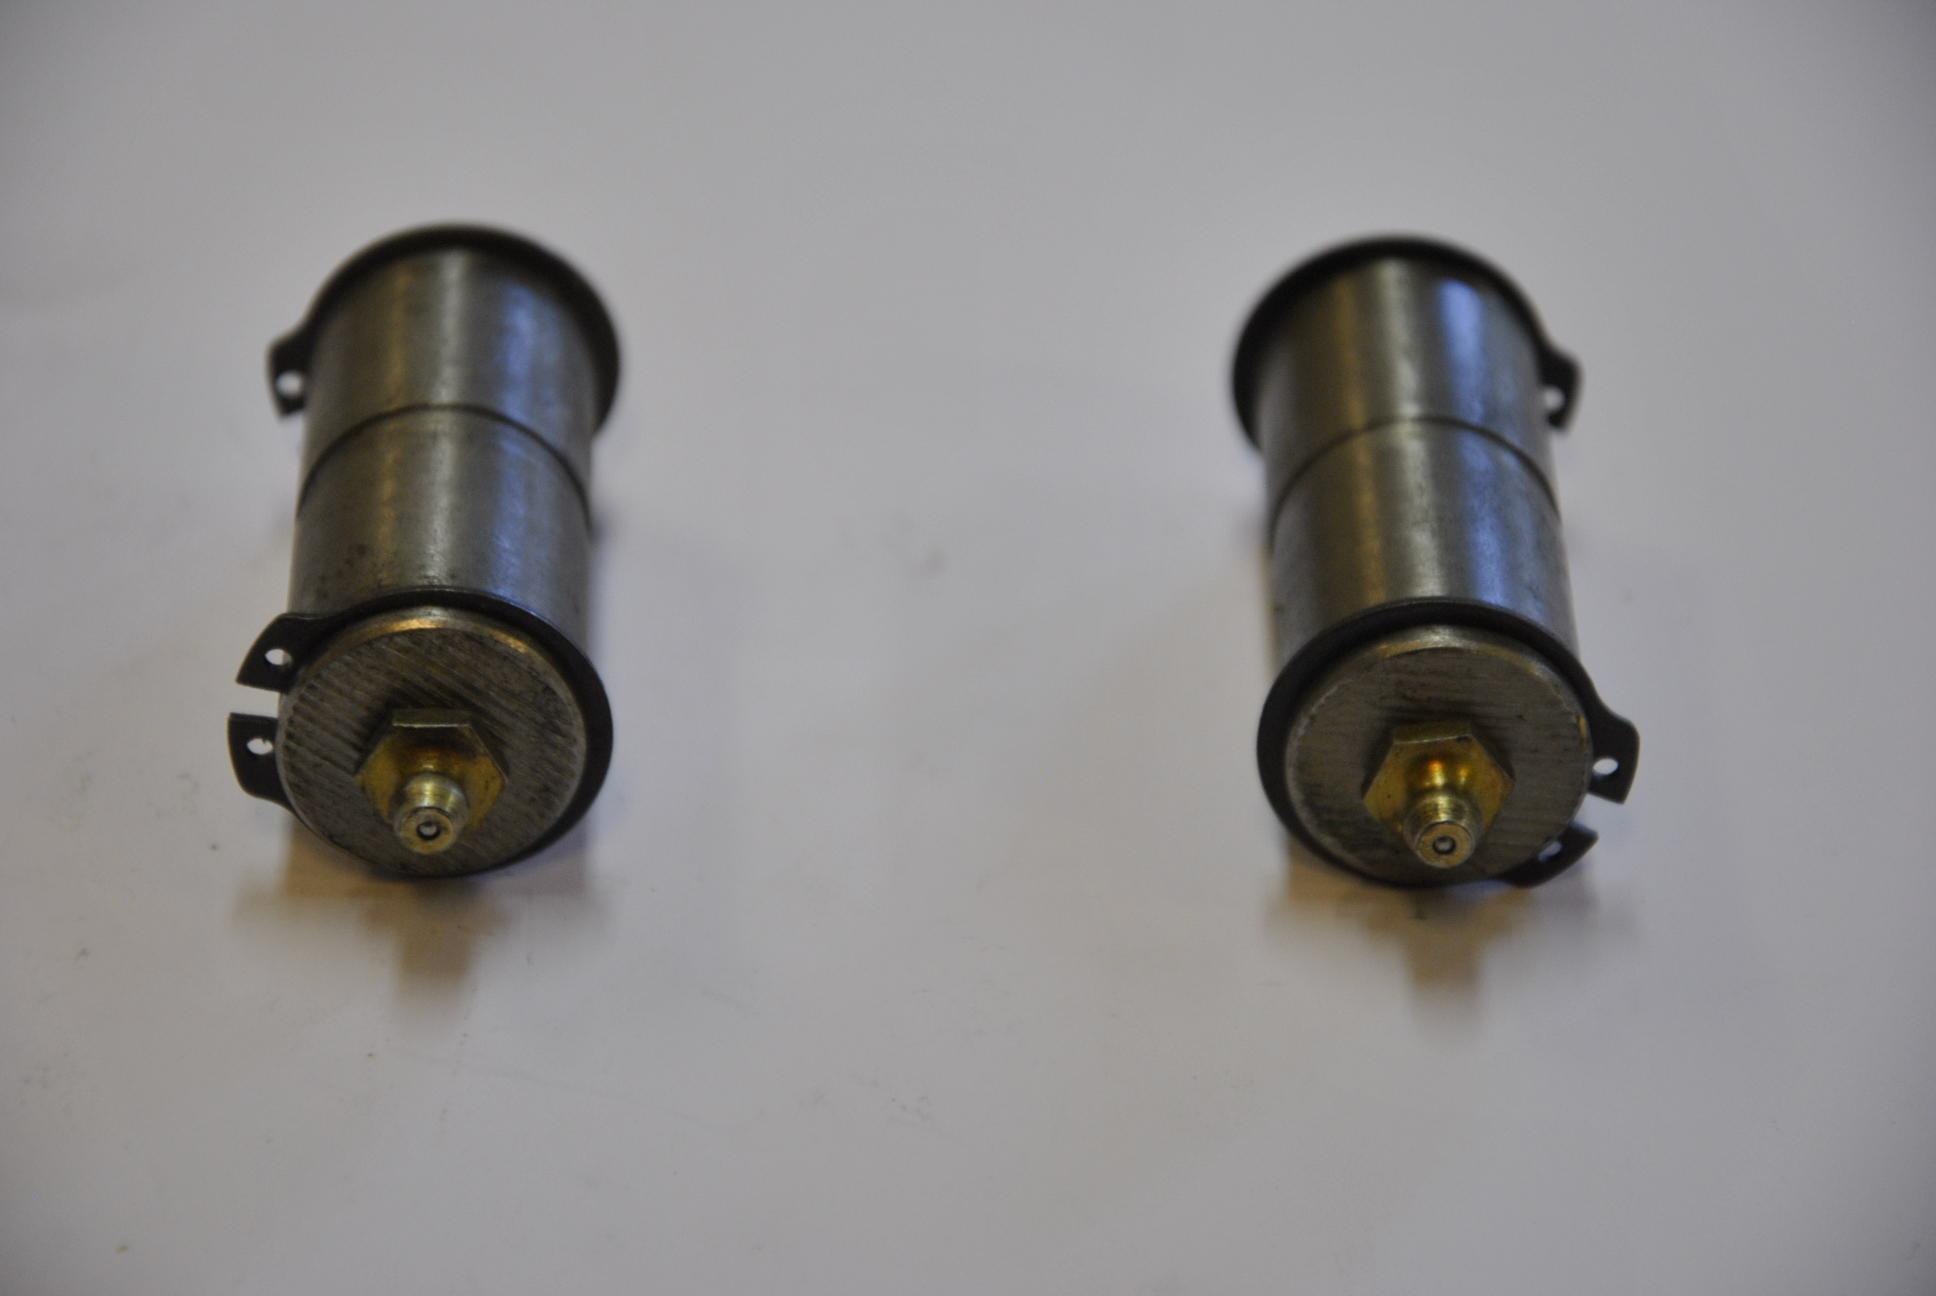 Палец крепления цилиндра подъема-опускания устройства скручивания проволоки, 2 шт./комп.